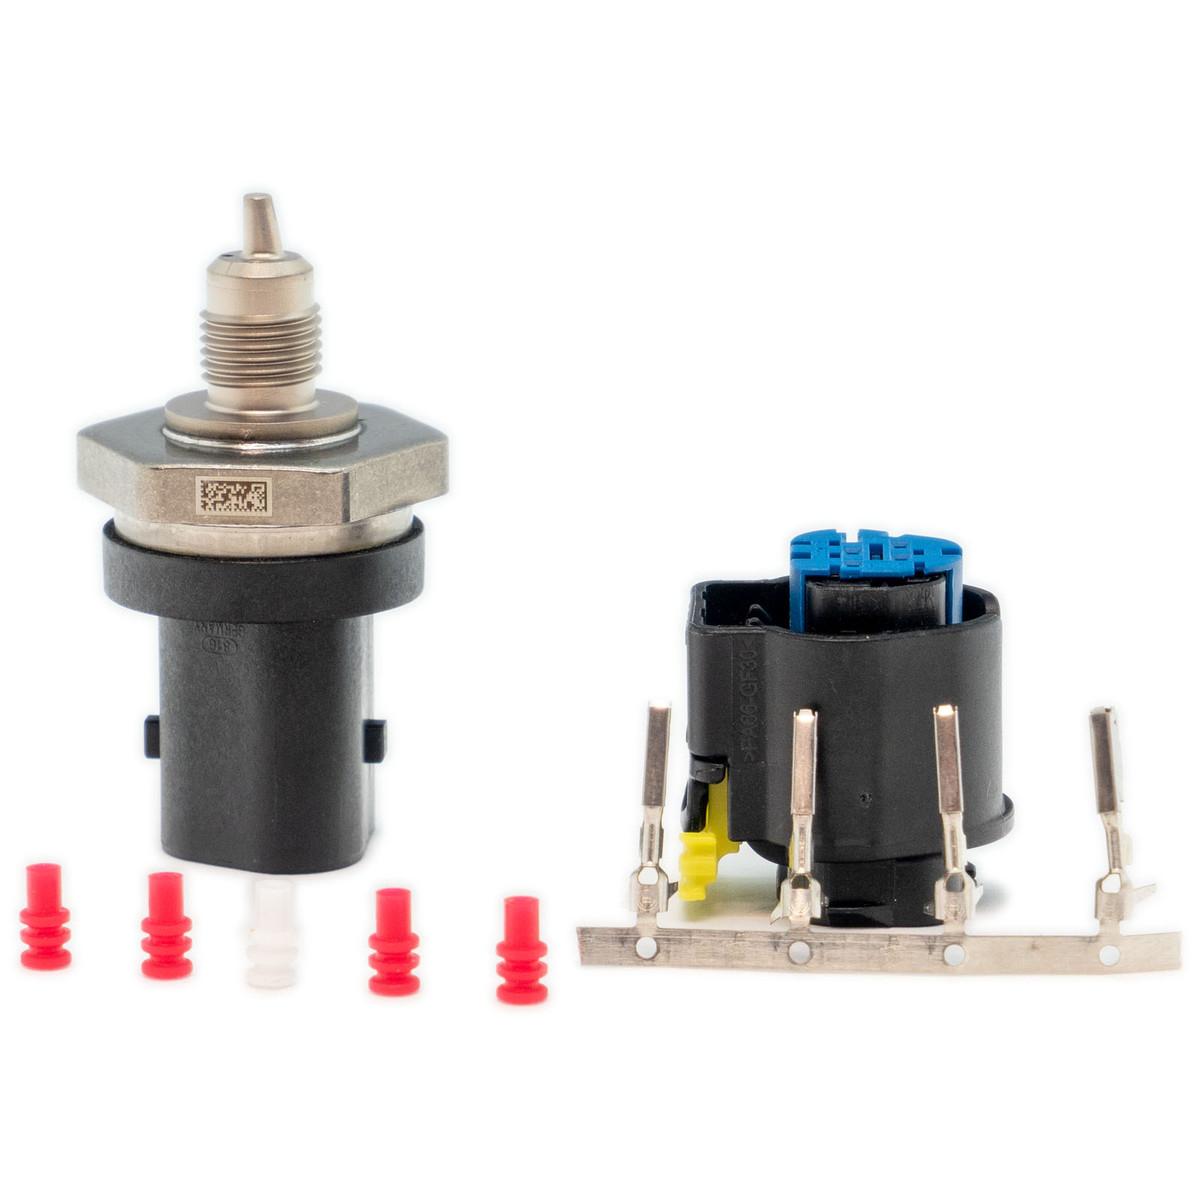 Bilde av Combined Pressure and Temperature Sensor (CPTS)